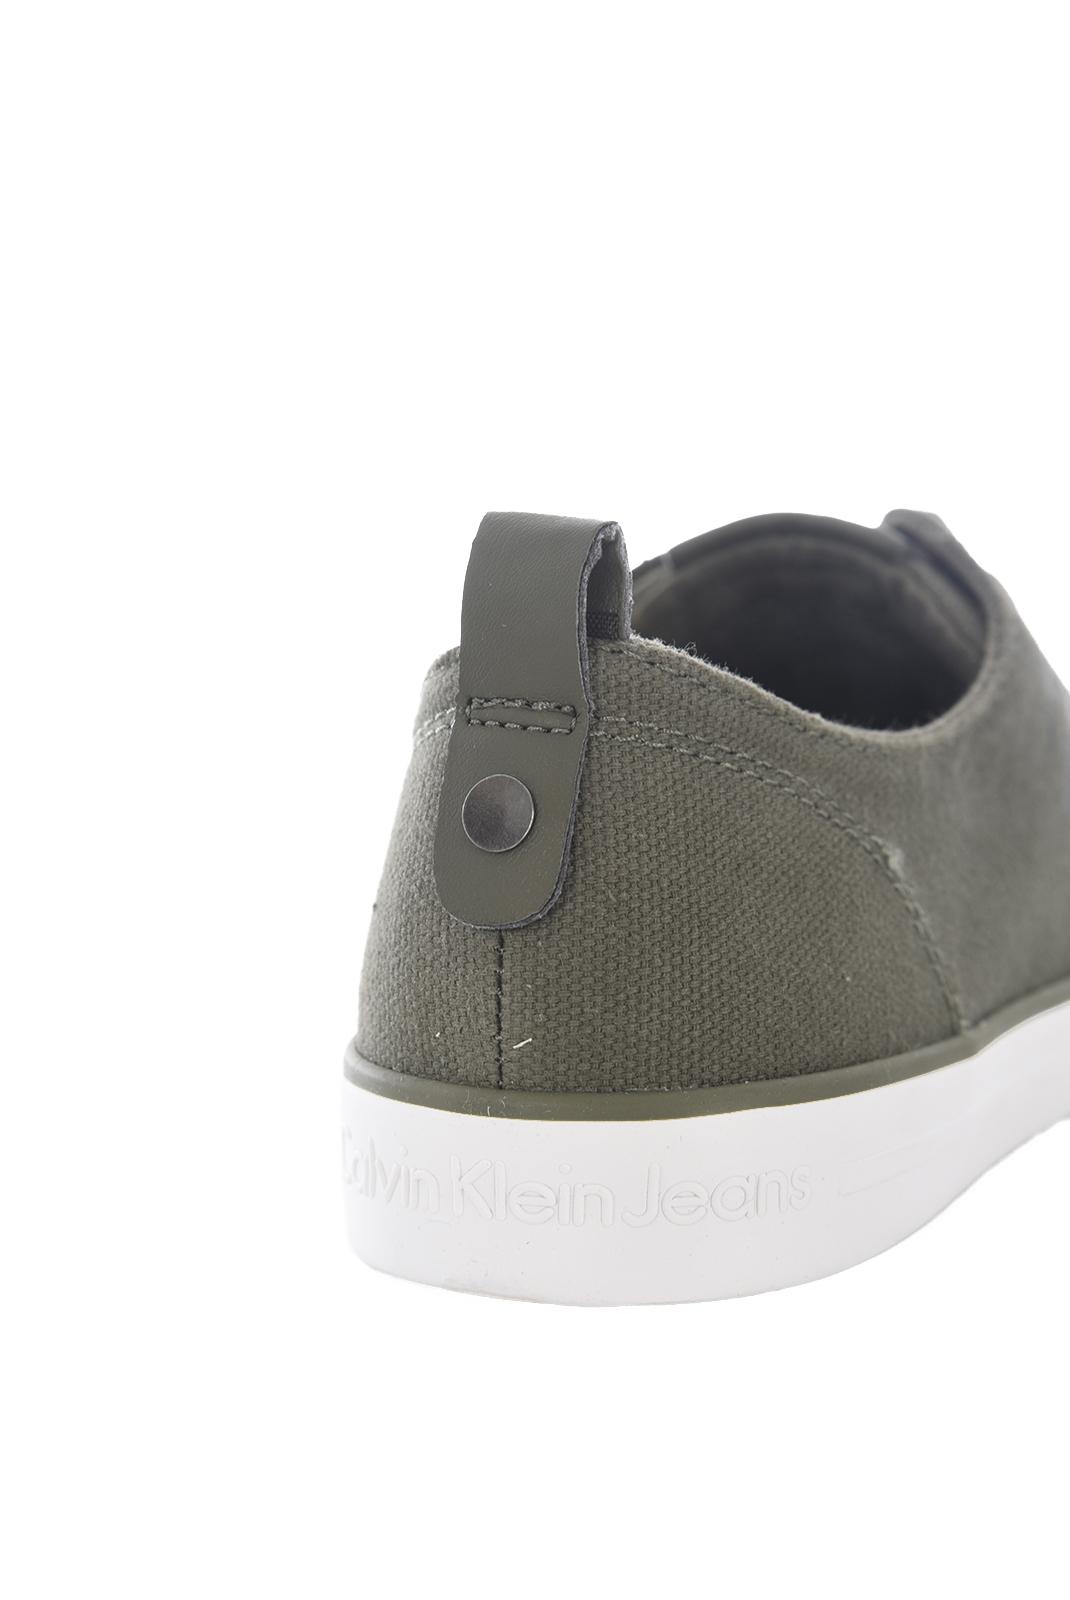 Baskets / Sneakers  Calvin klein DORA CANVAS MILITARY